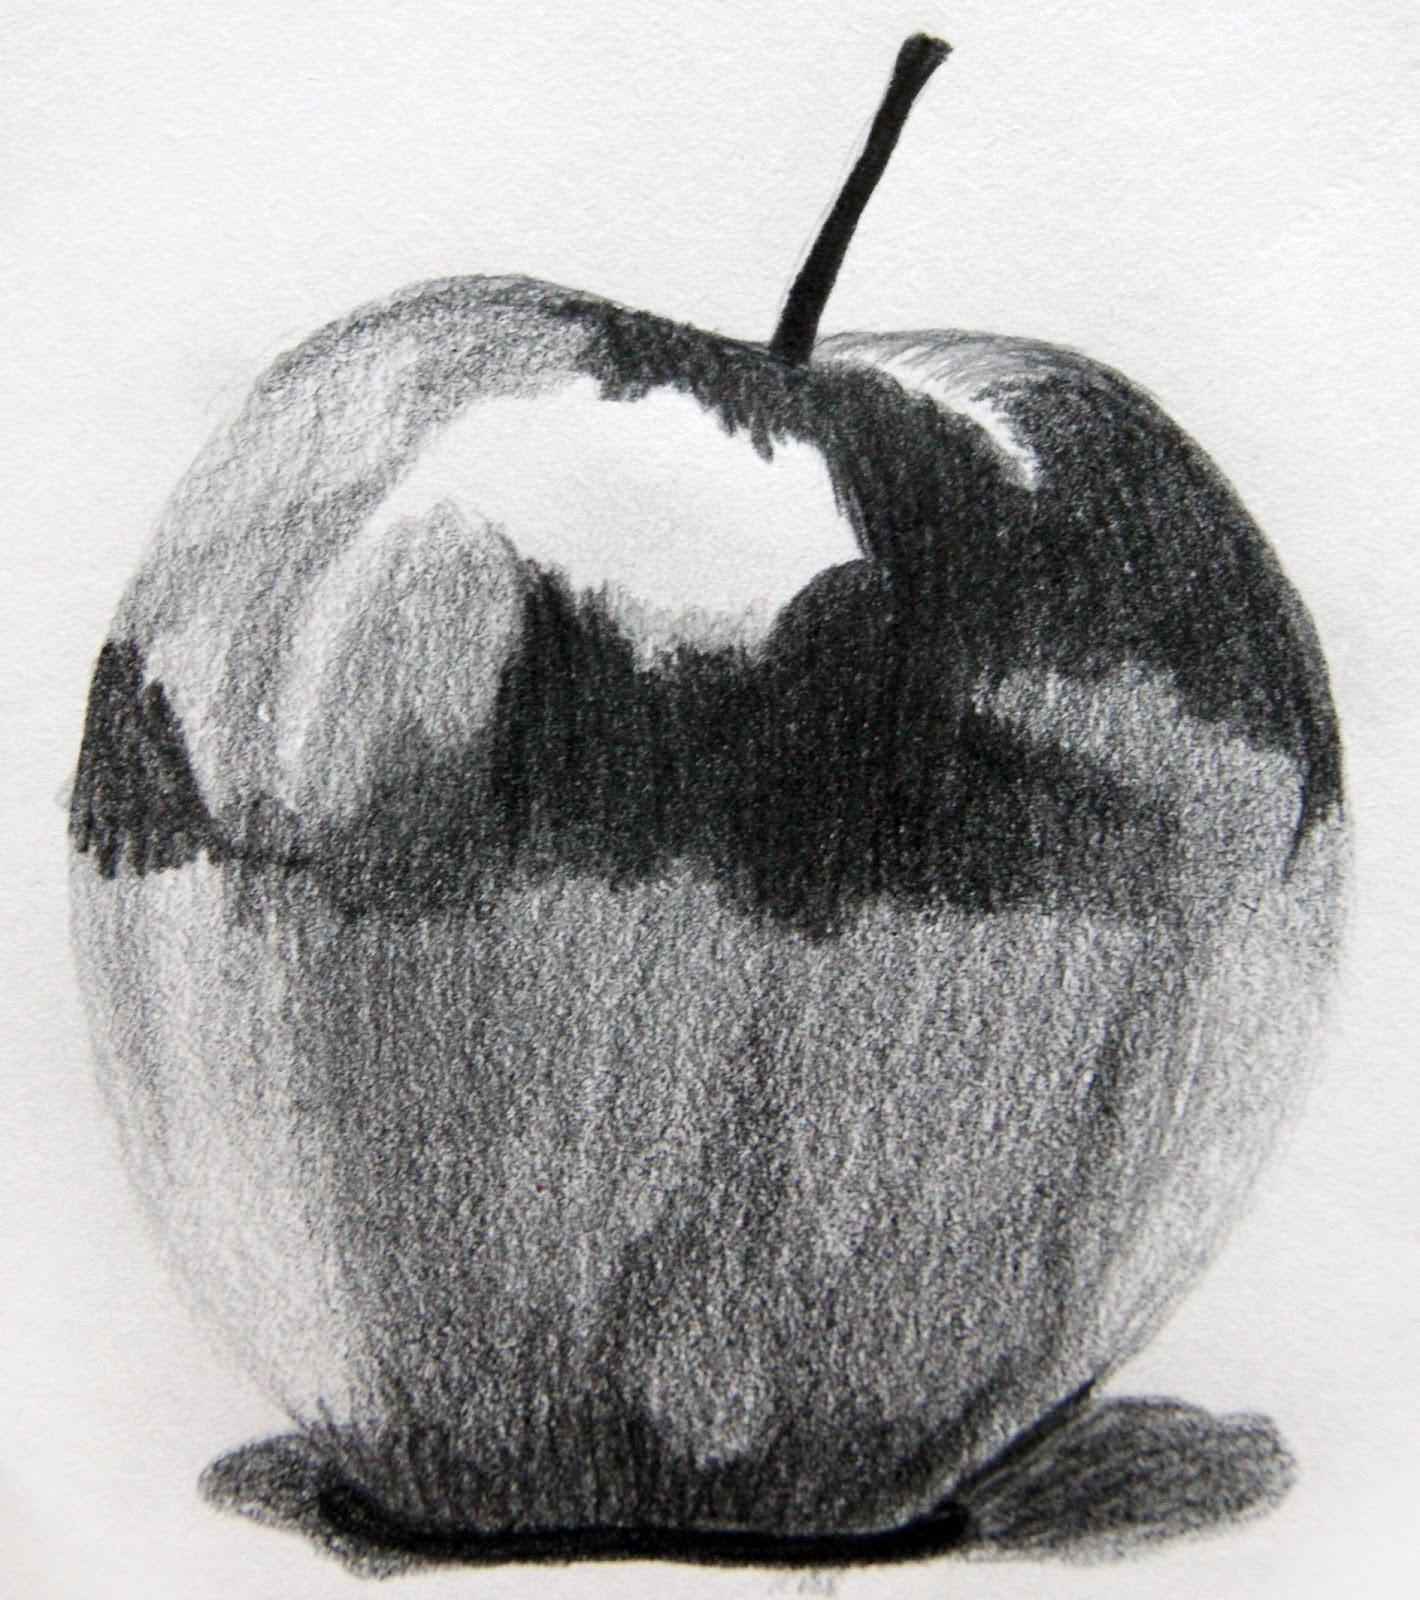 Dibujar Con Carboncillo Tecnica Del Lapiz